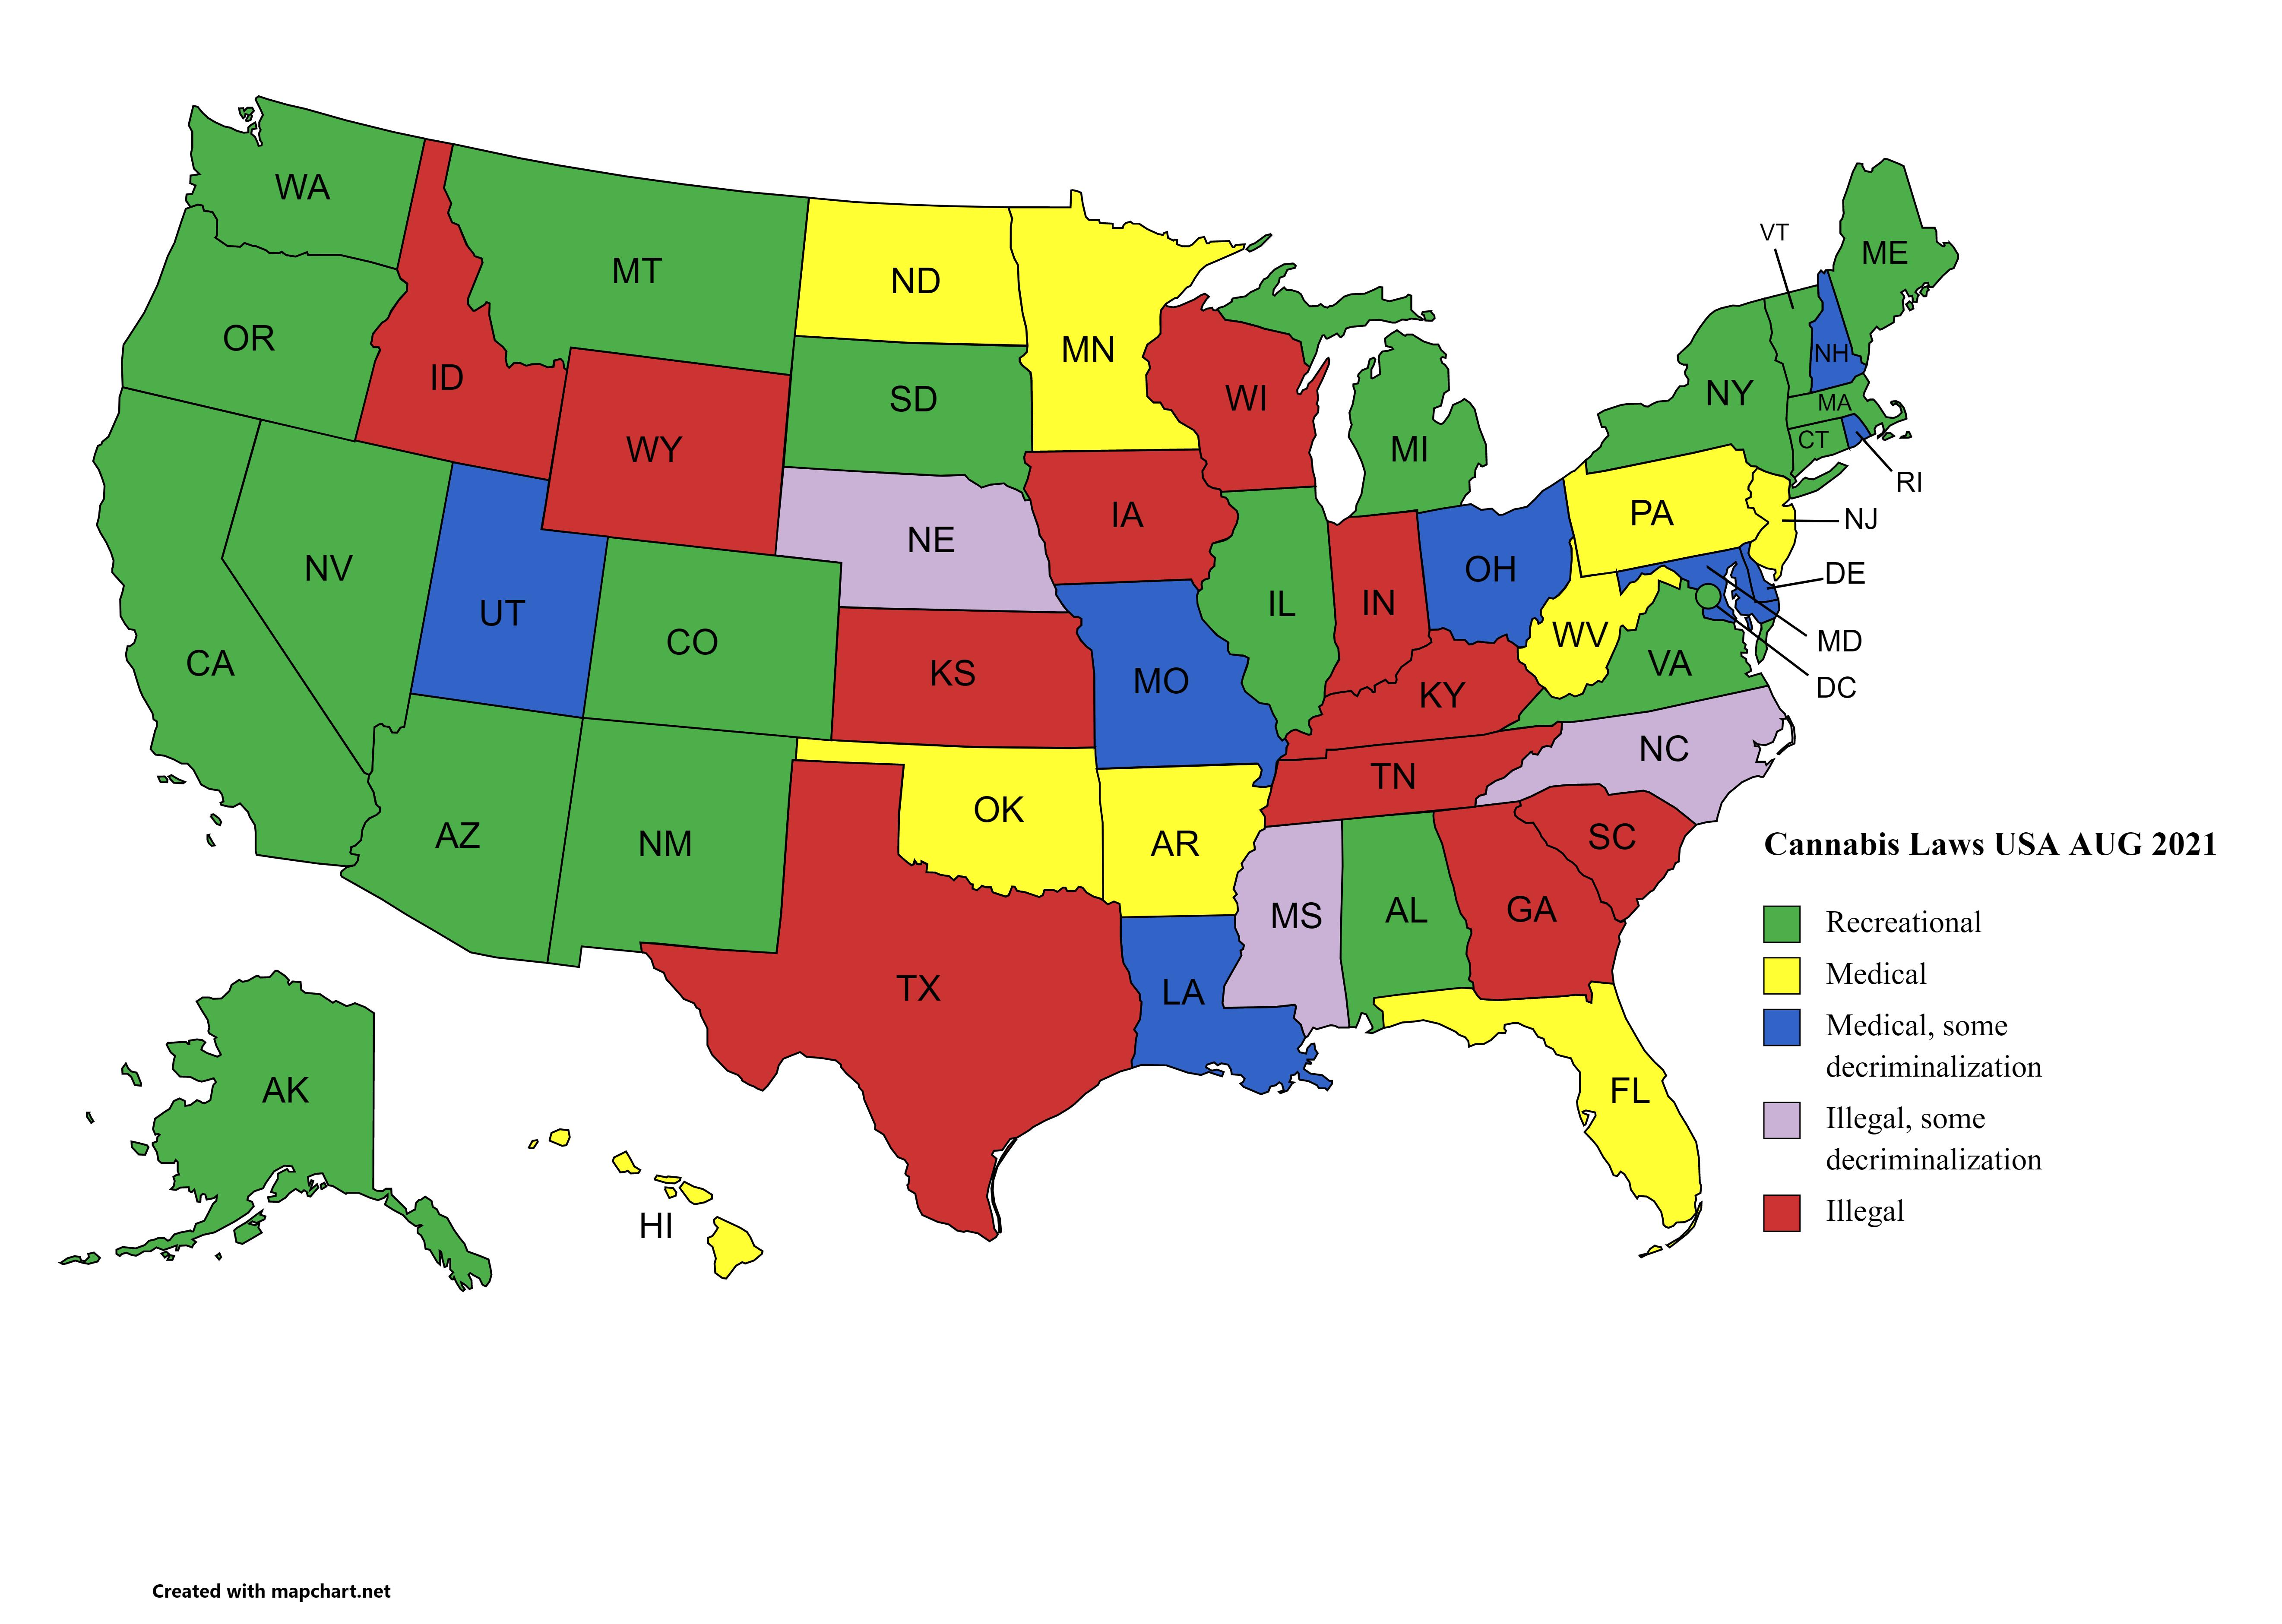 Cannabis_Laws_USA_AUG_2021